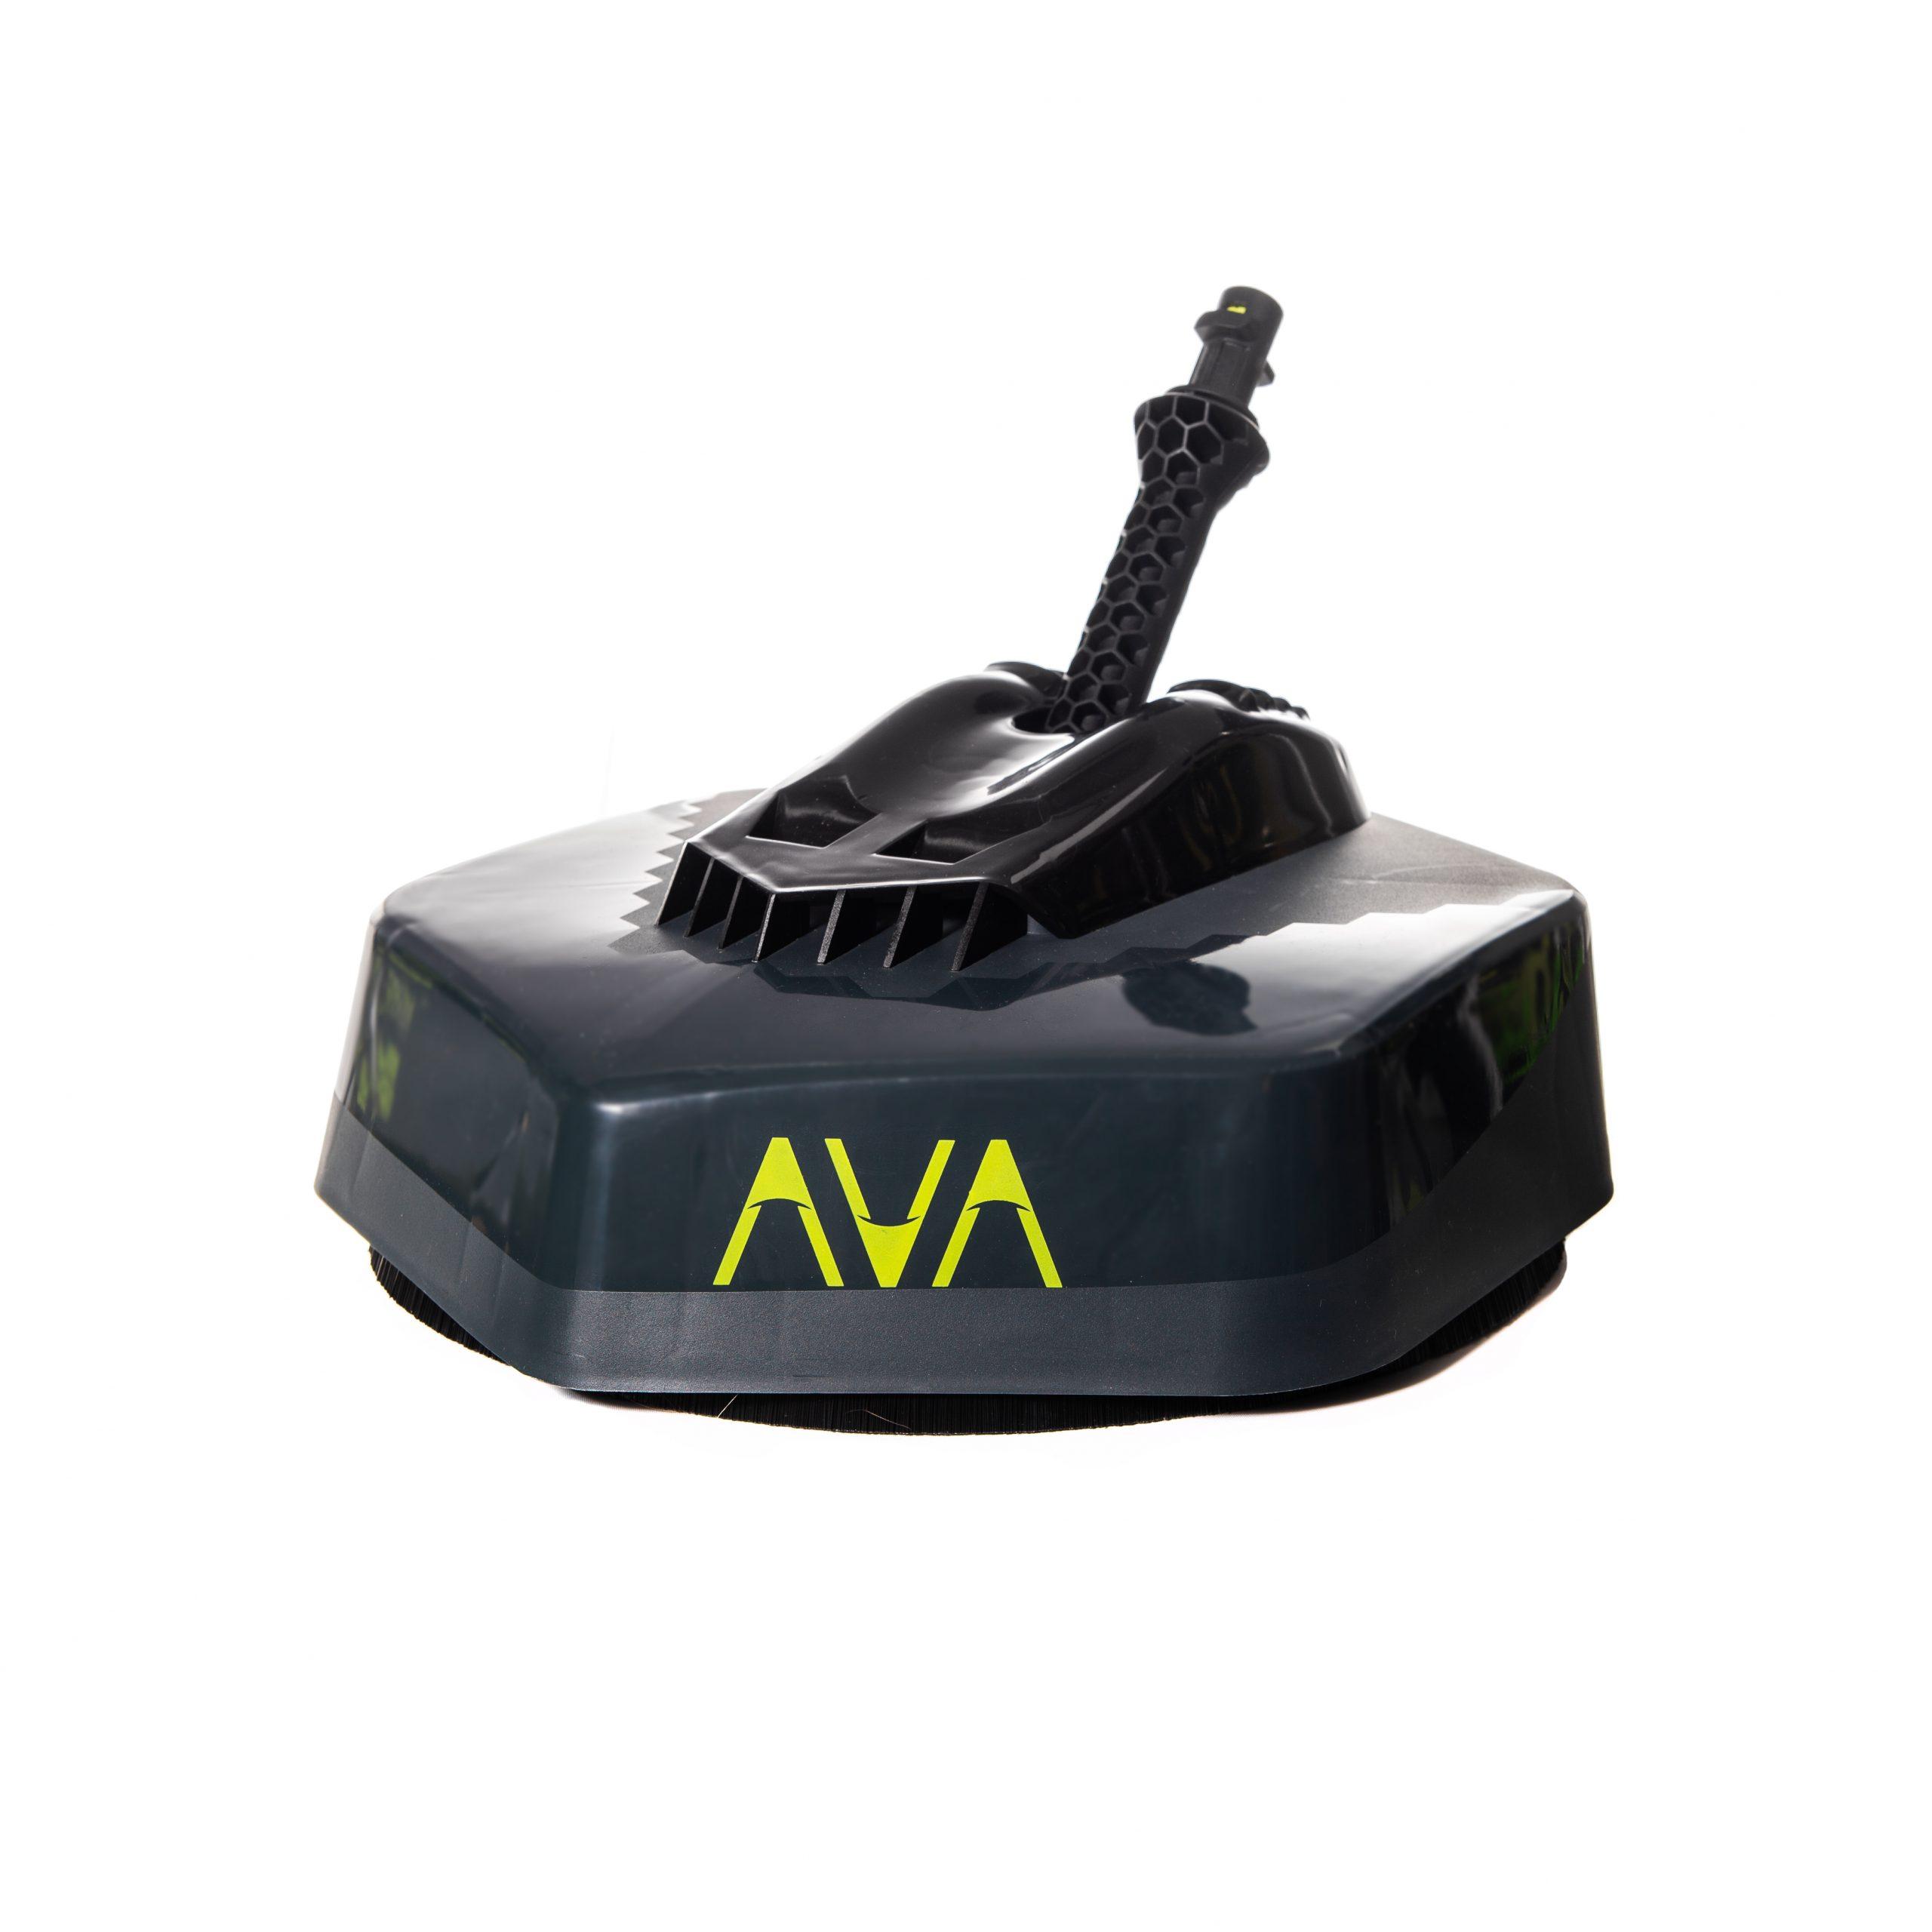 AVA Basic Patio cleaner